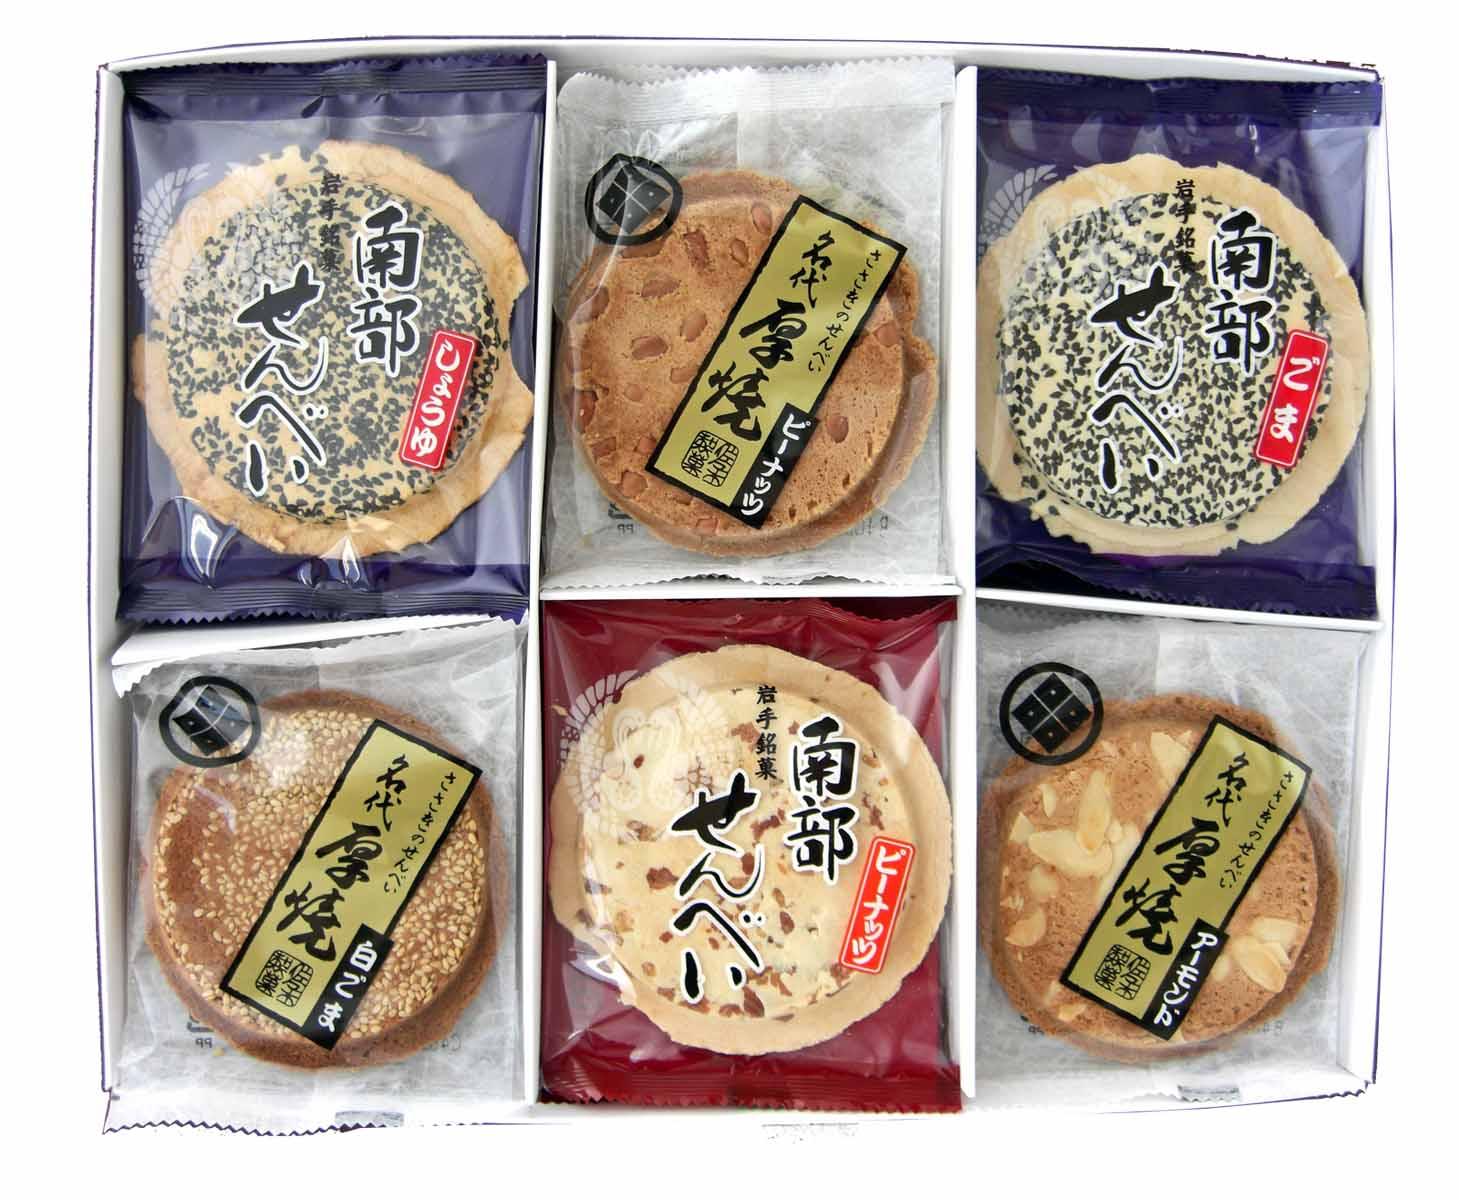 【送料無料】【ネット限定】 厚焼南部詰合せ 【33枚箱入】佐々木製菓